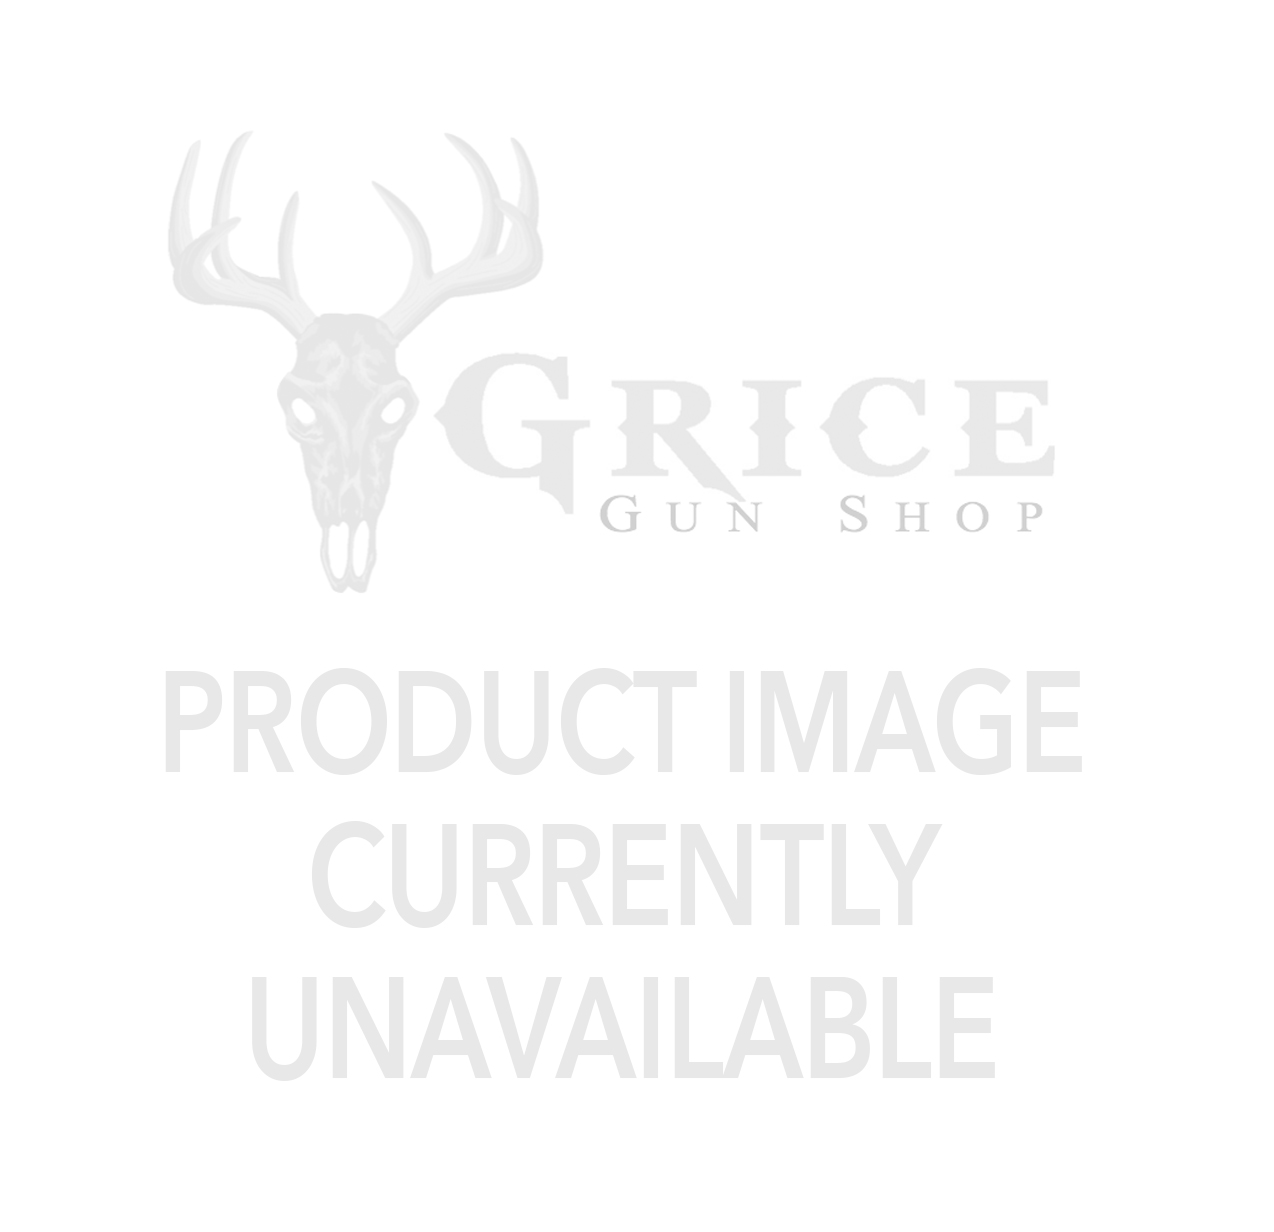 "Thompson Center - Pro Hunter 15"" Stainless Fluted Barrel 223 Rem"